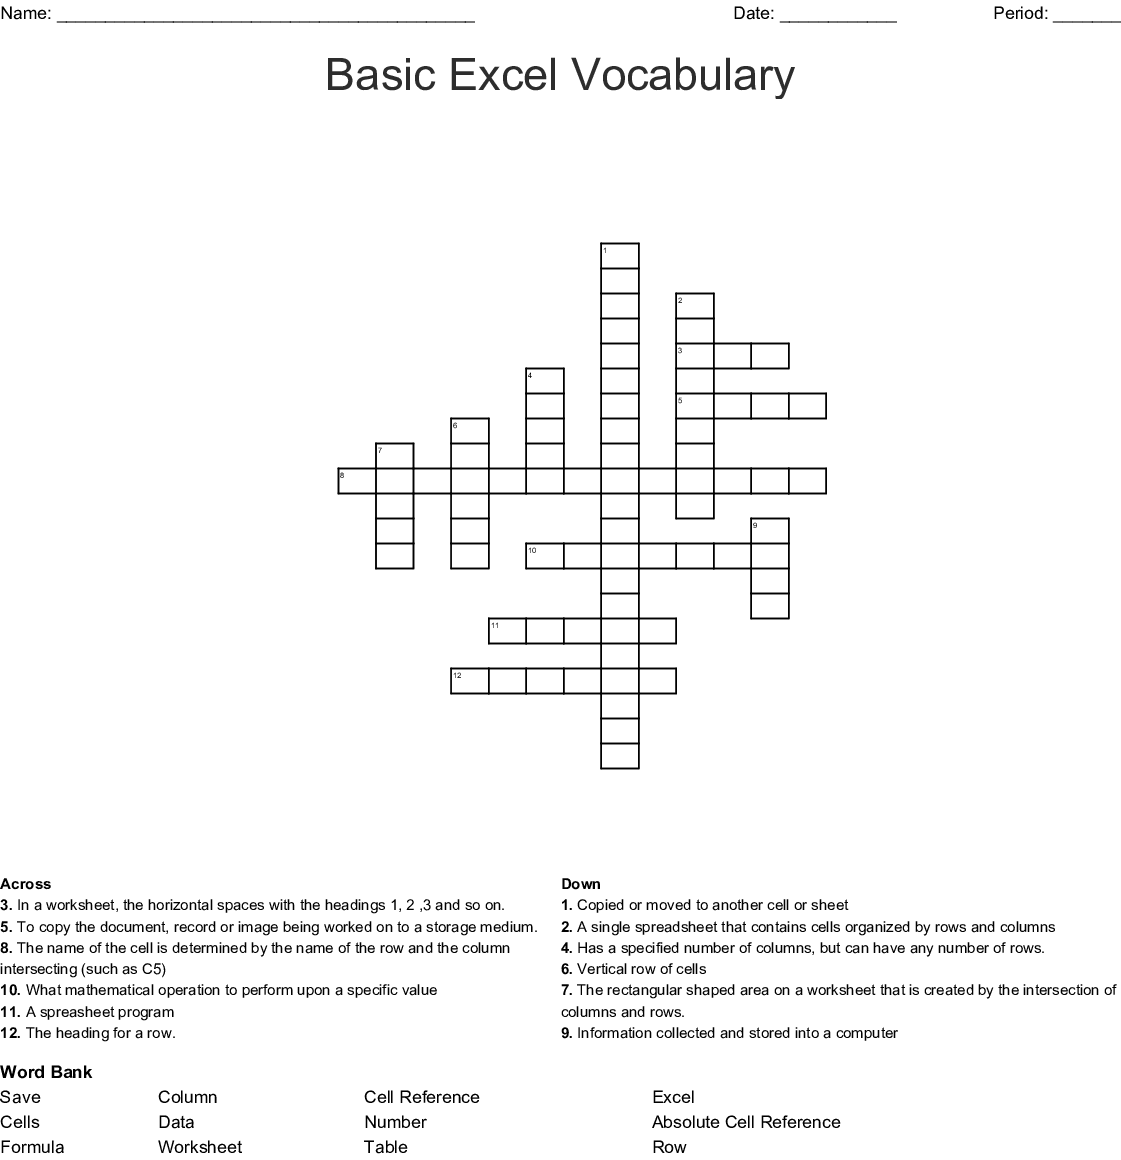 Basic Excel Vocabulary Crossword